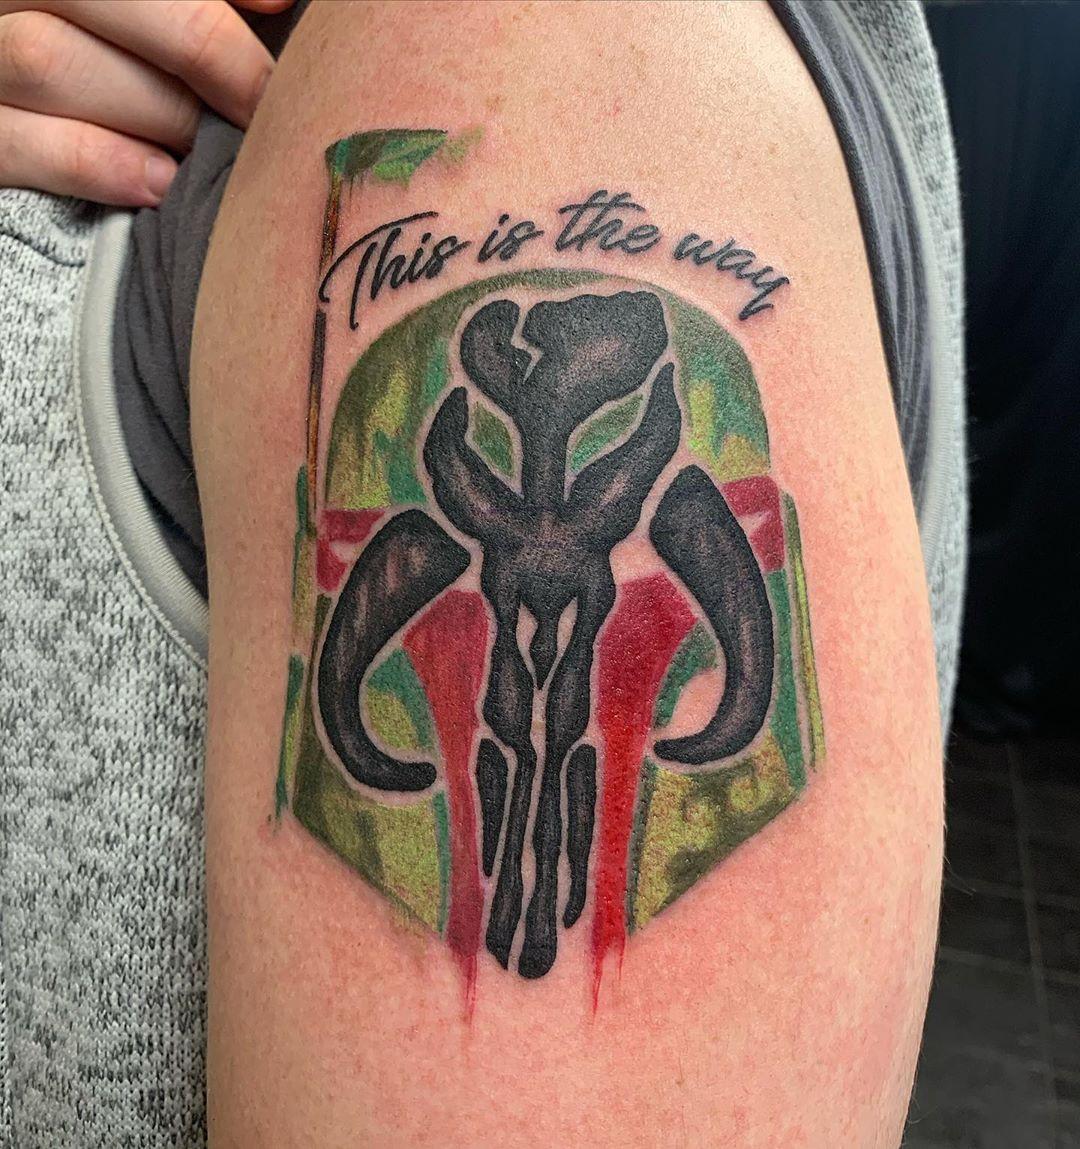 Mandalorian insignia on Boba Fett's helmet tattoo